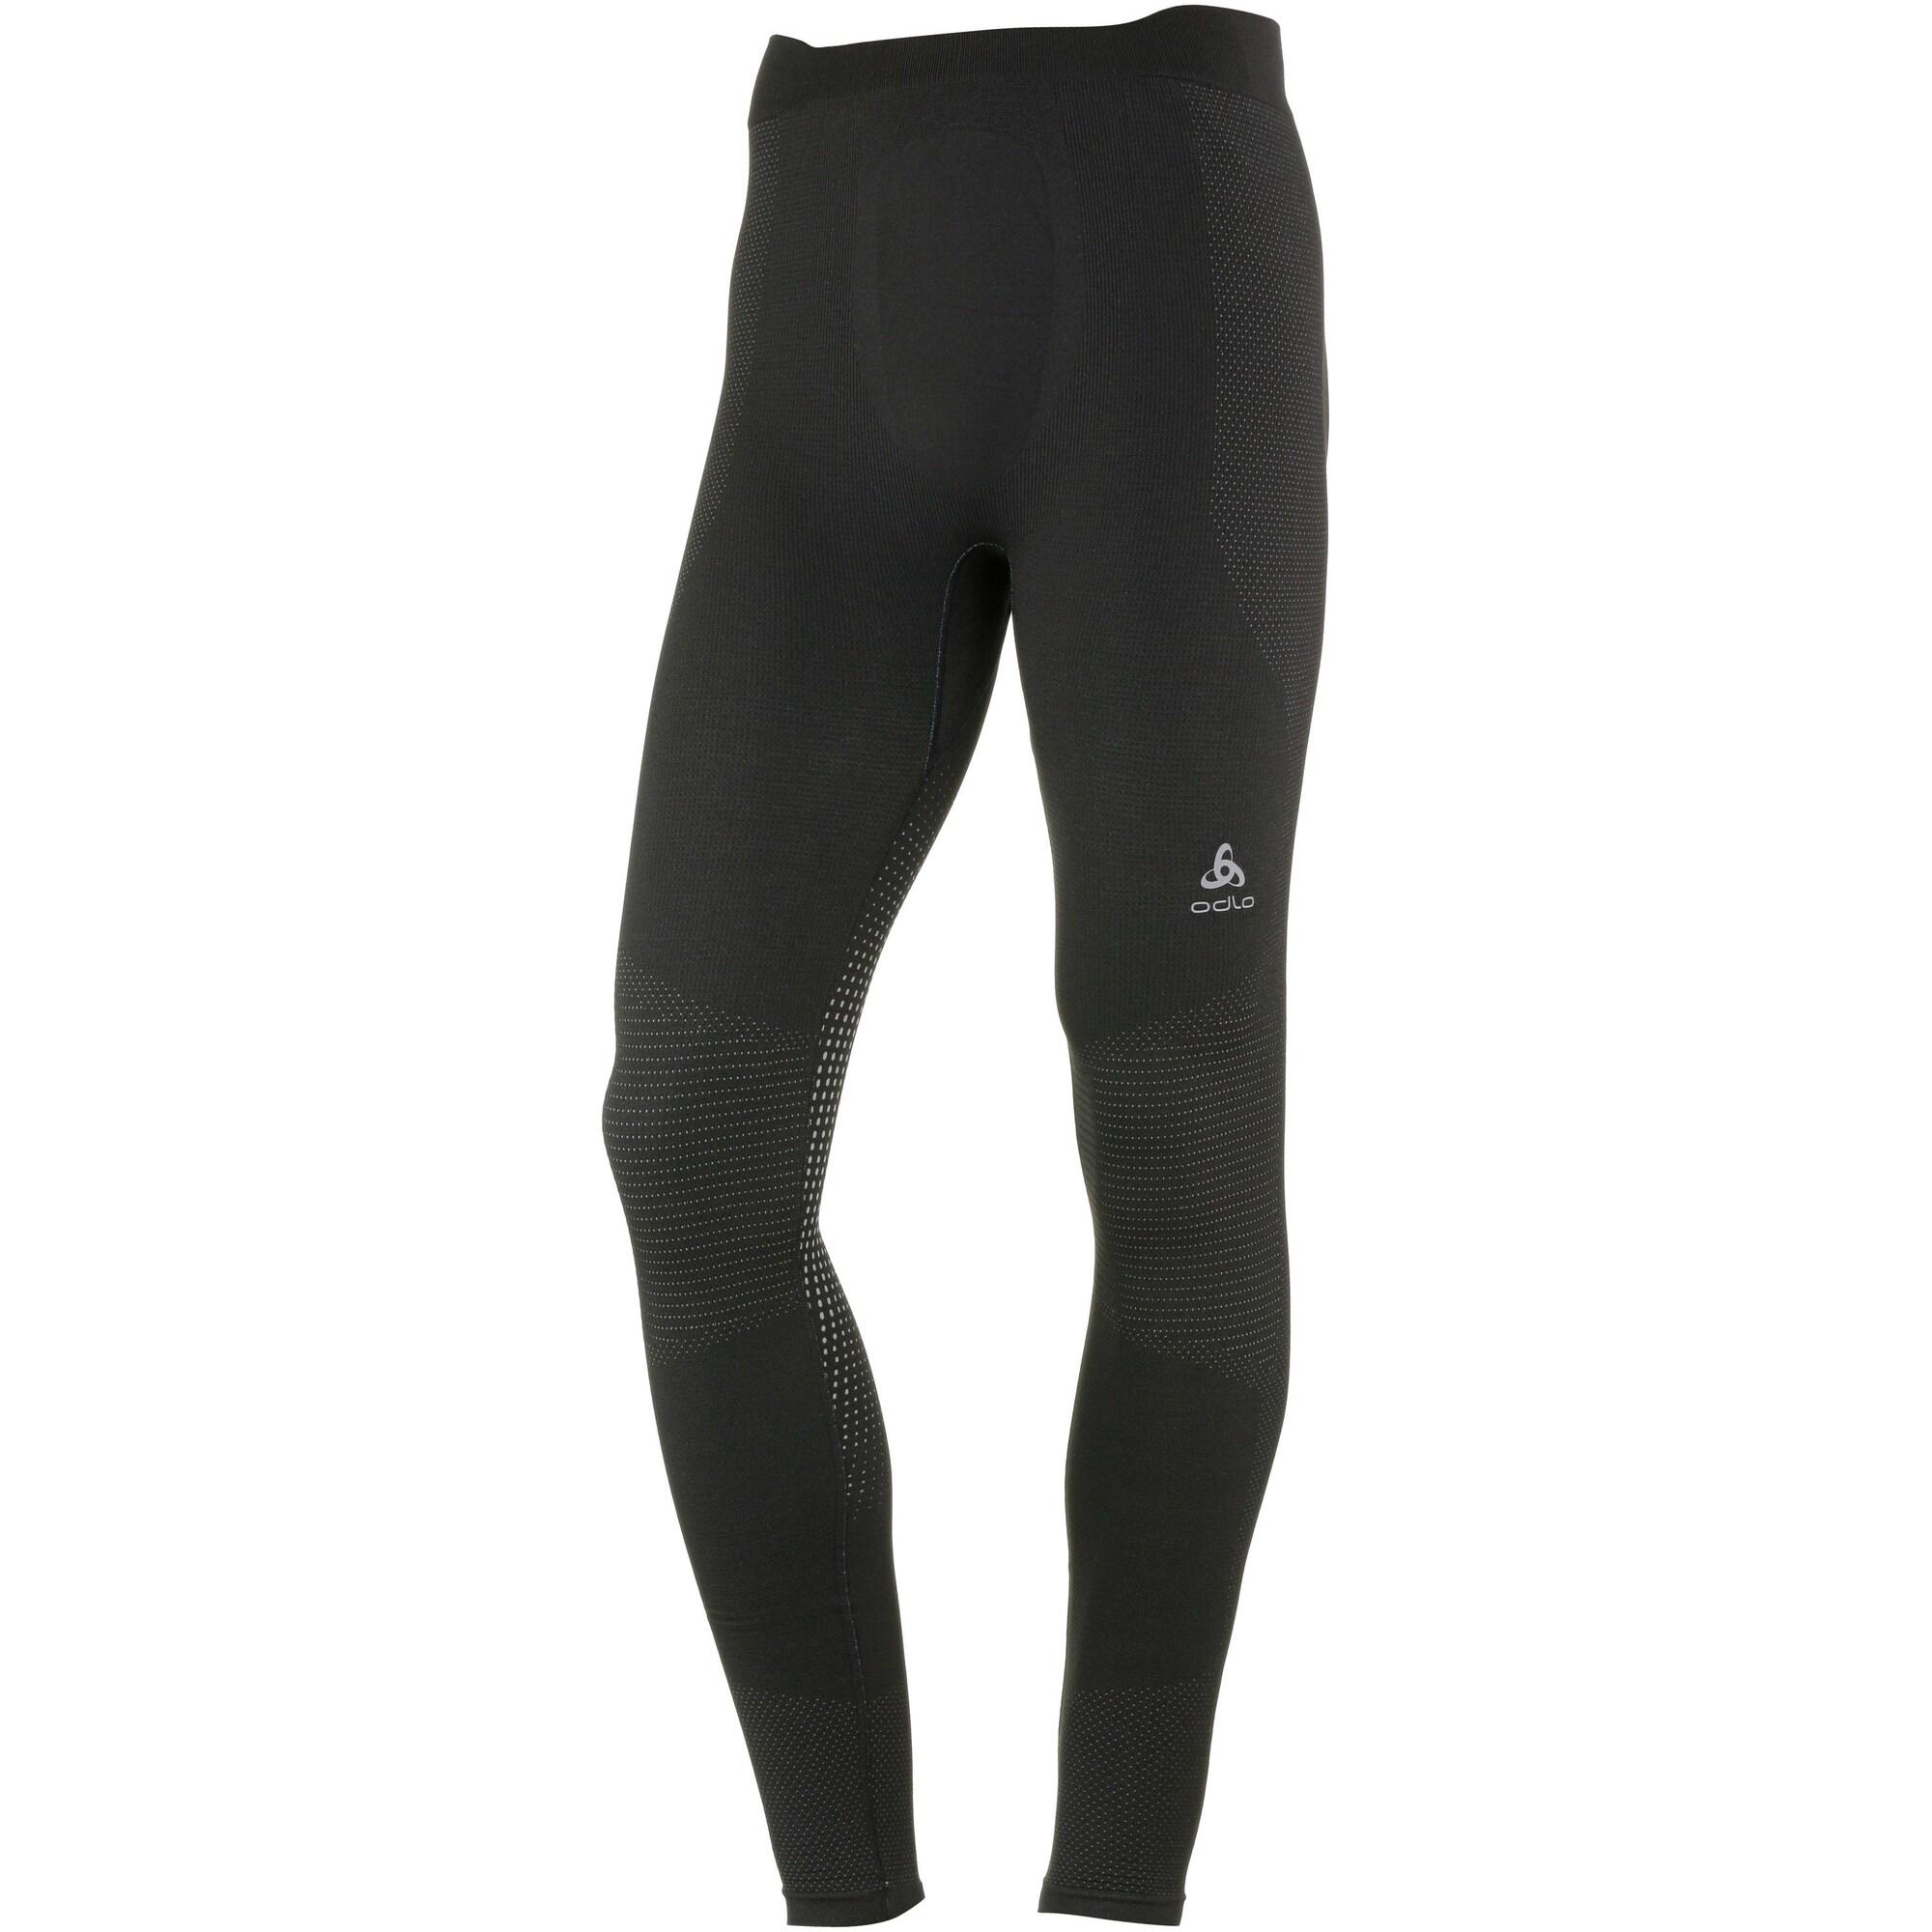 Funktionsunterhose | Sportbekleidung > Funktionswäsche > Thermoleggings | ODLO